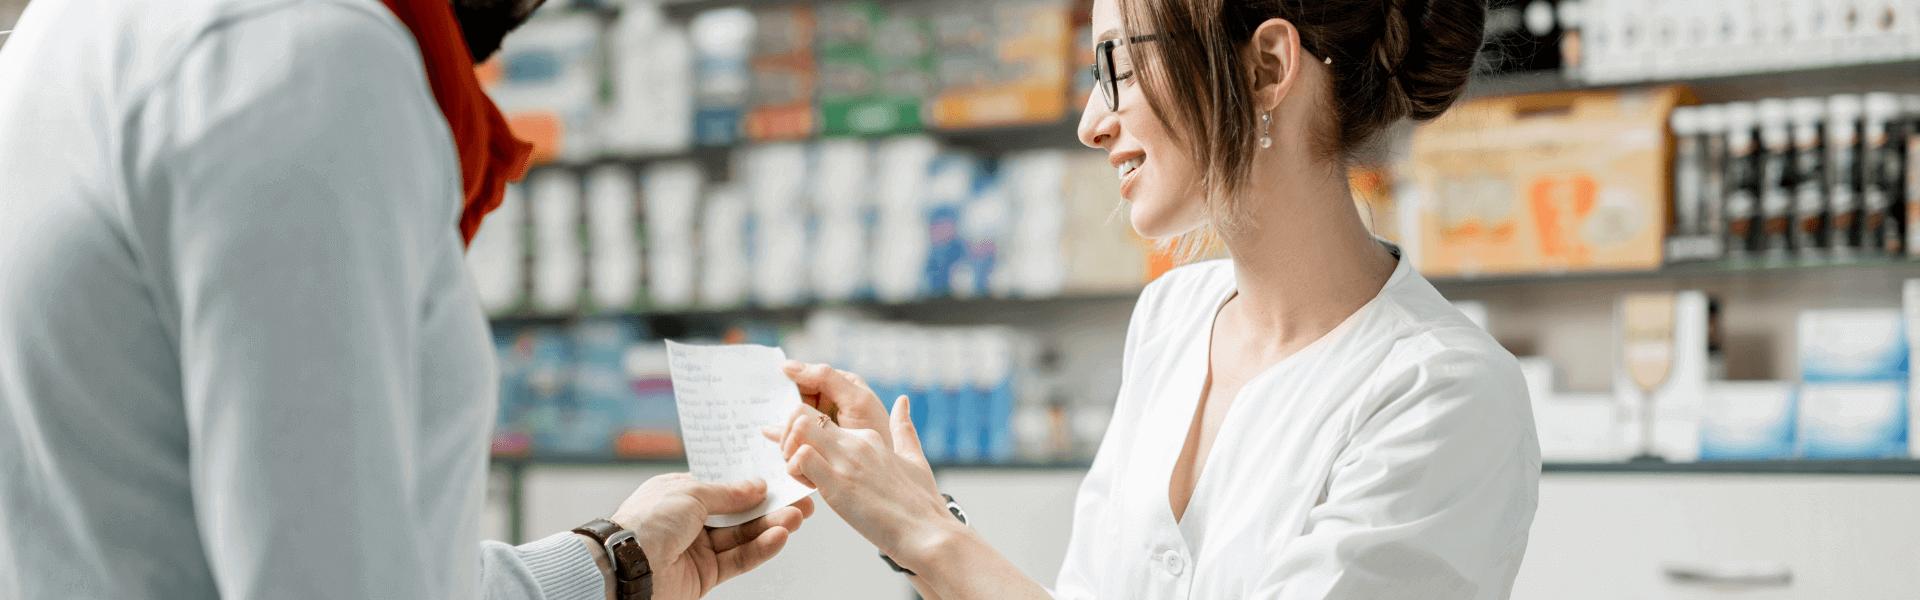 Curso auxiliar farmacia online